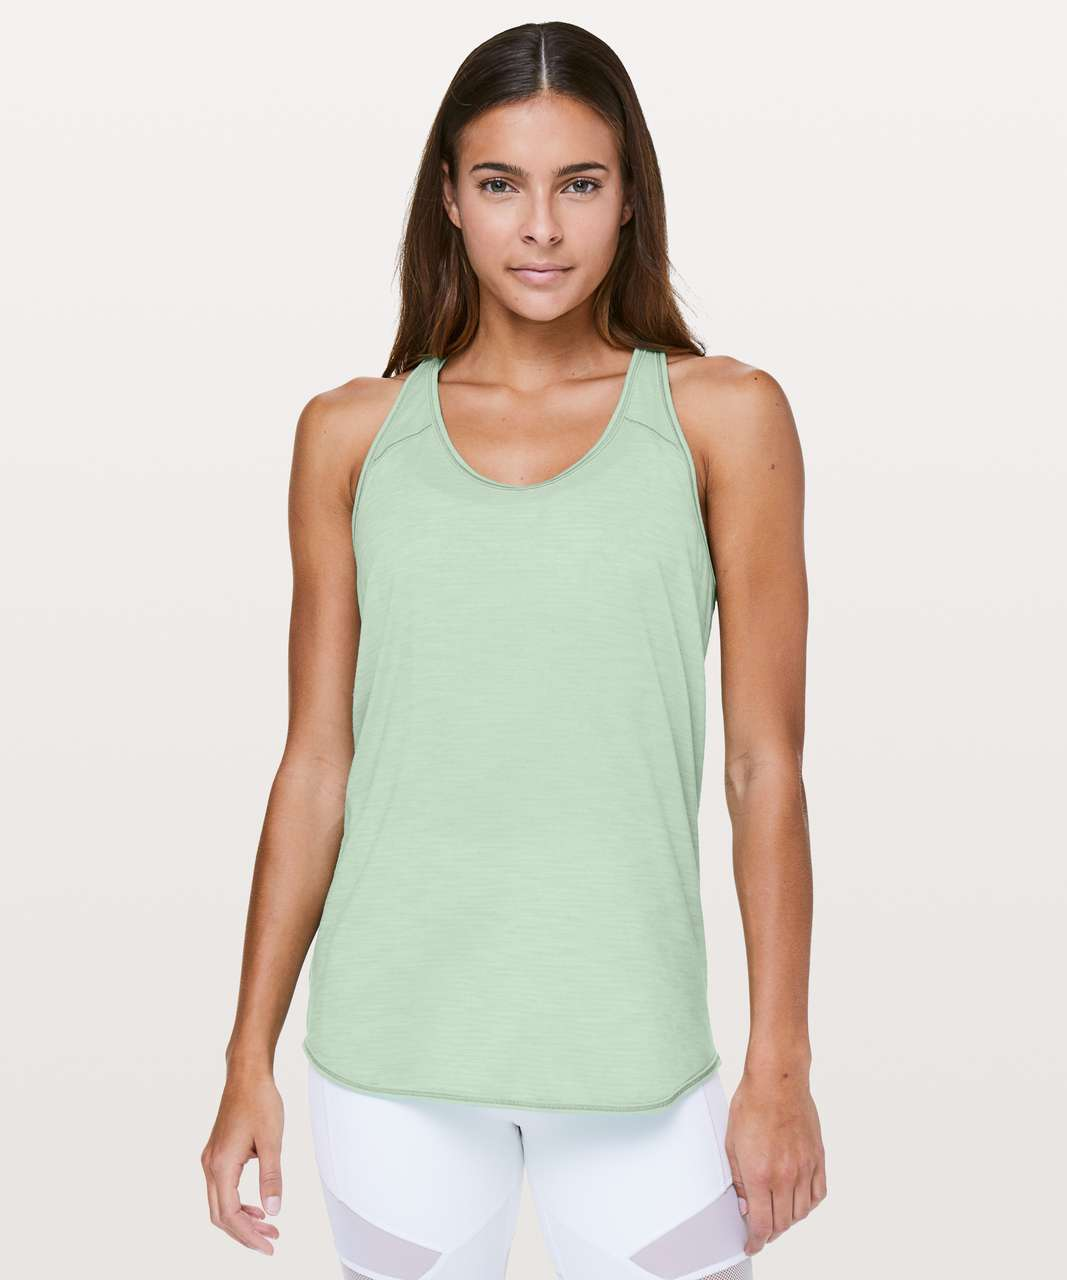 Lululemon Essential Tank - Heathered Opal Green